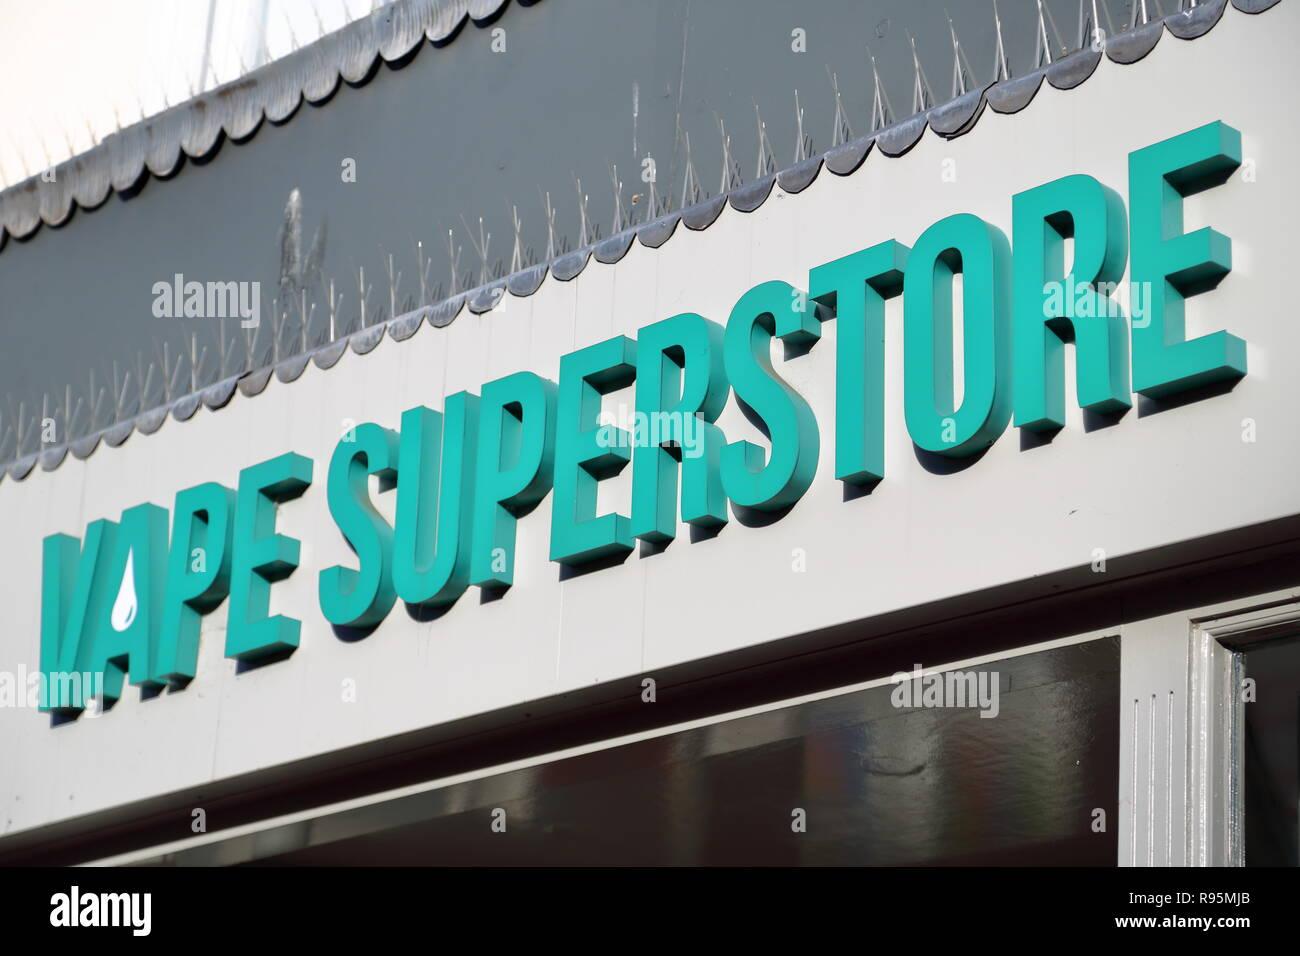 Vape Superstore logo above shop - Stock Image